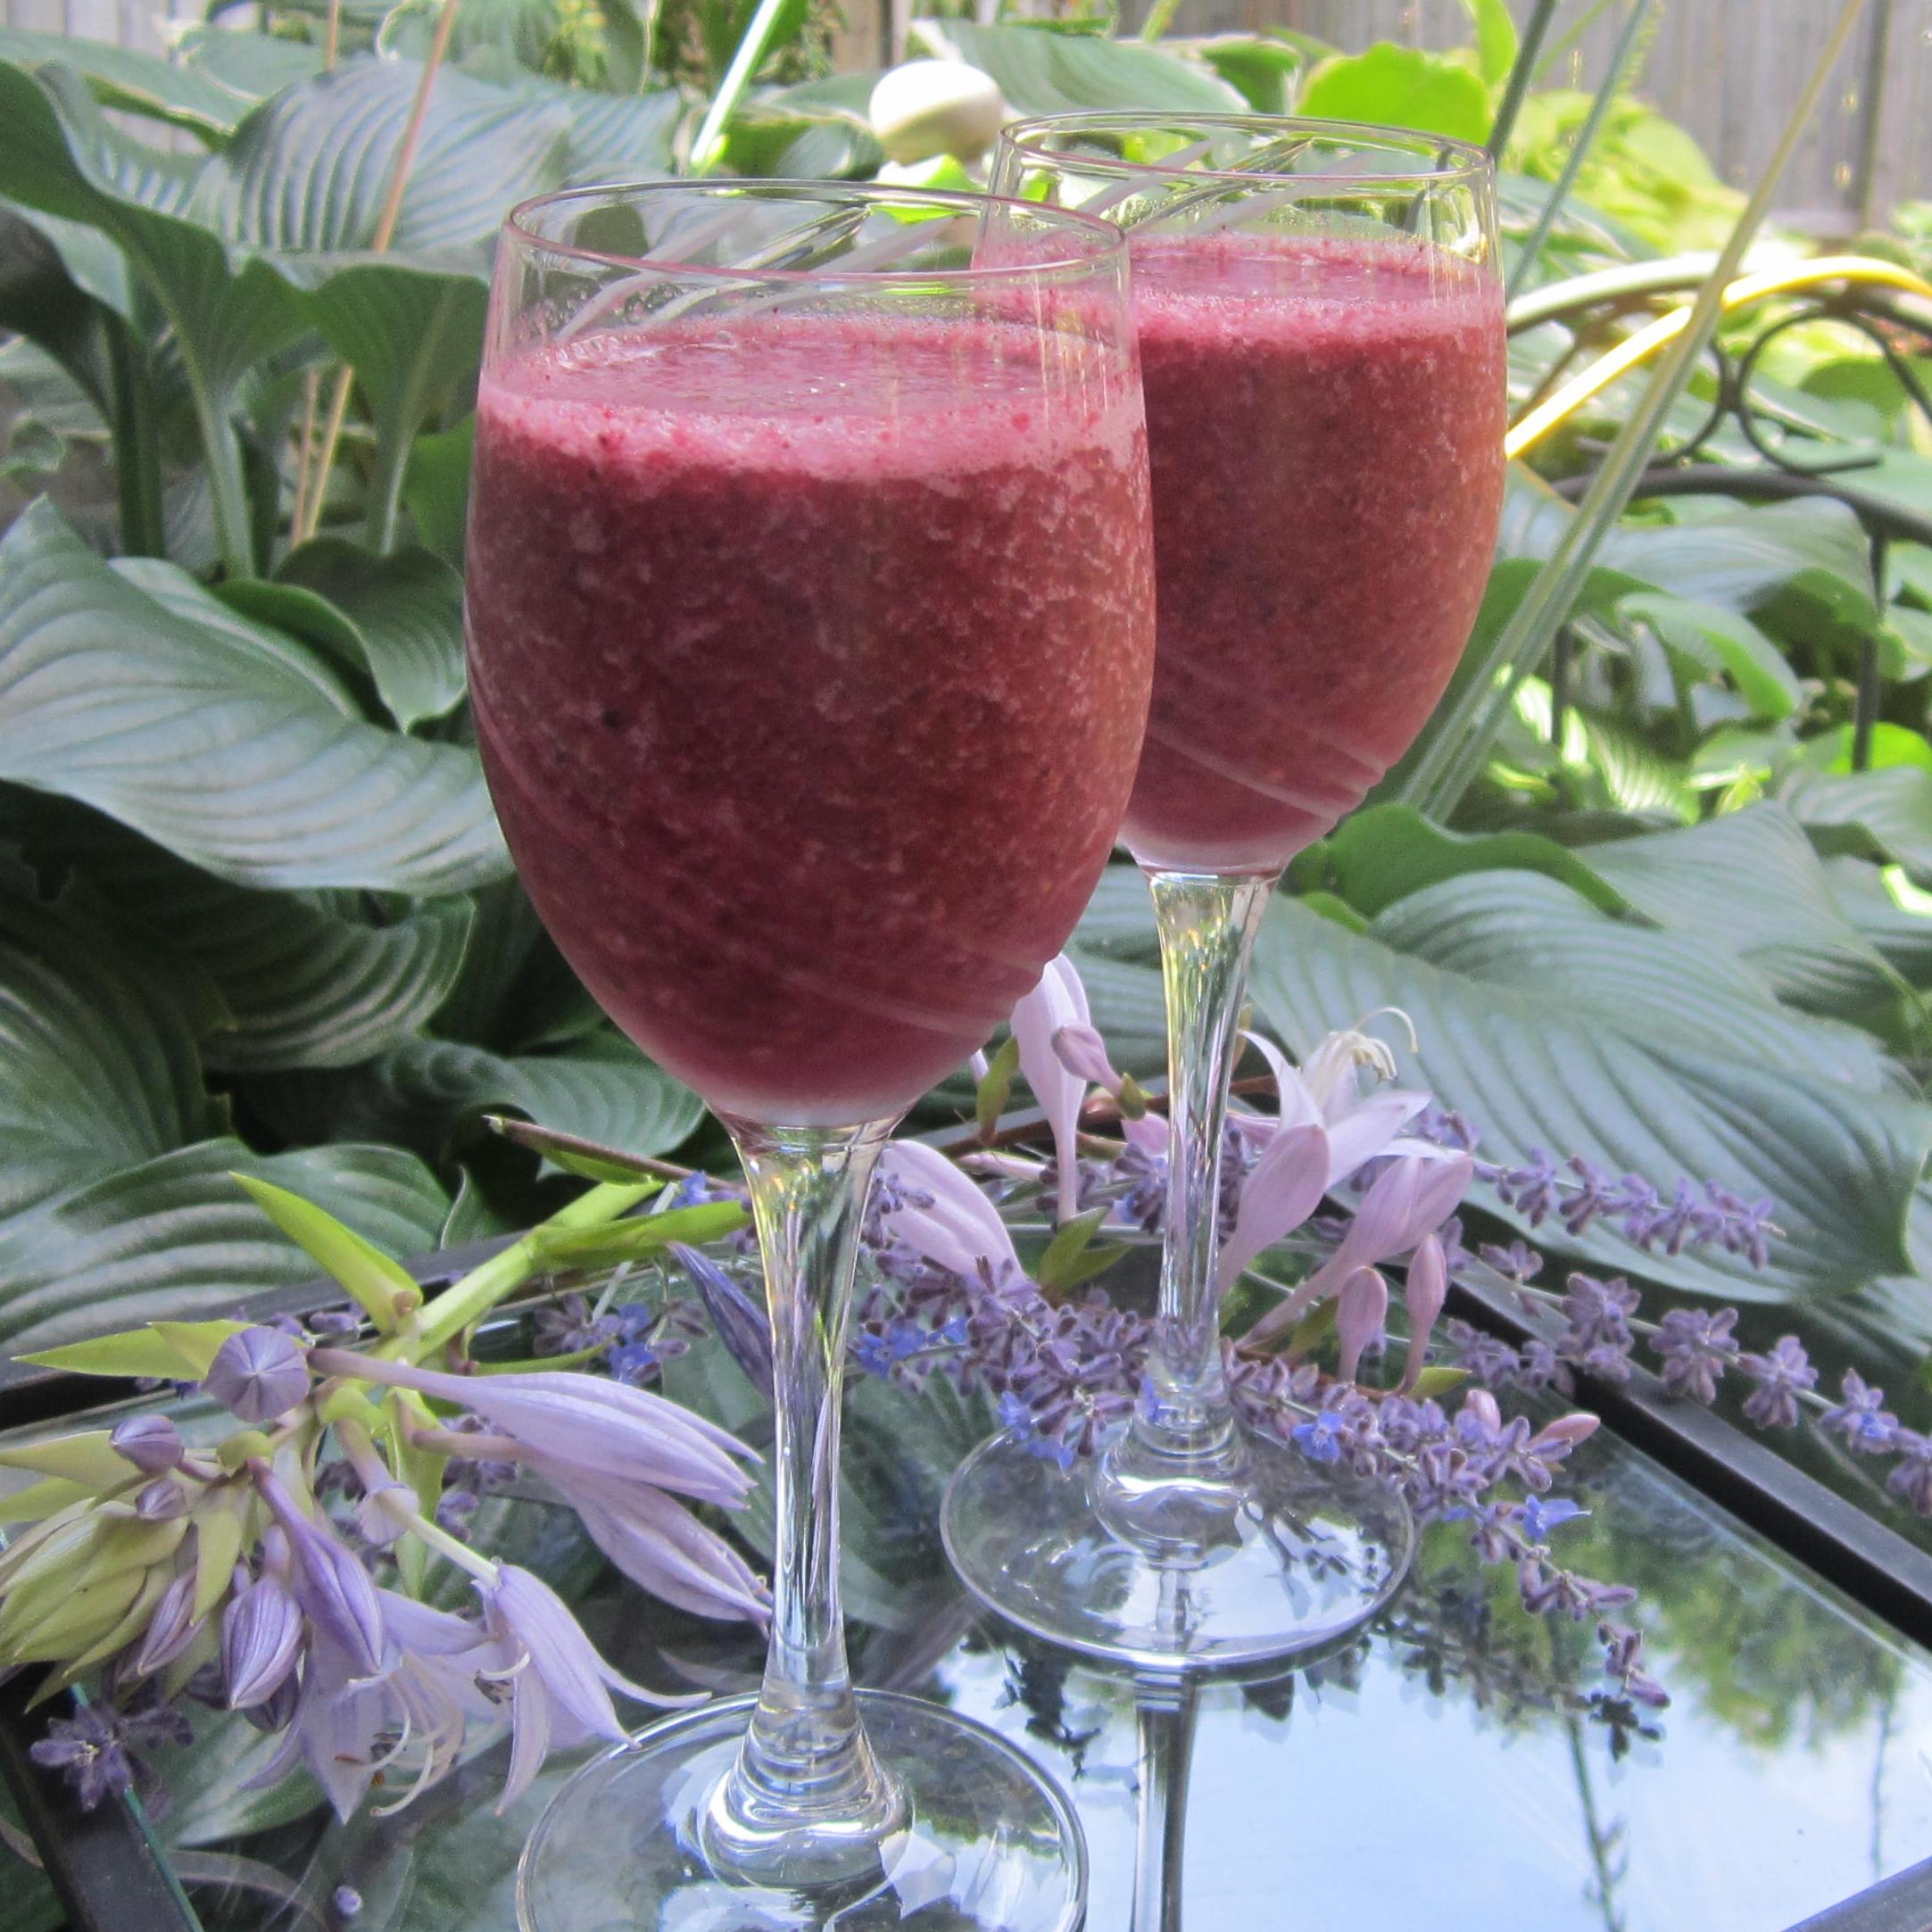 Berrylicious Frozen Sangria Slush